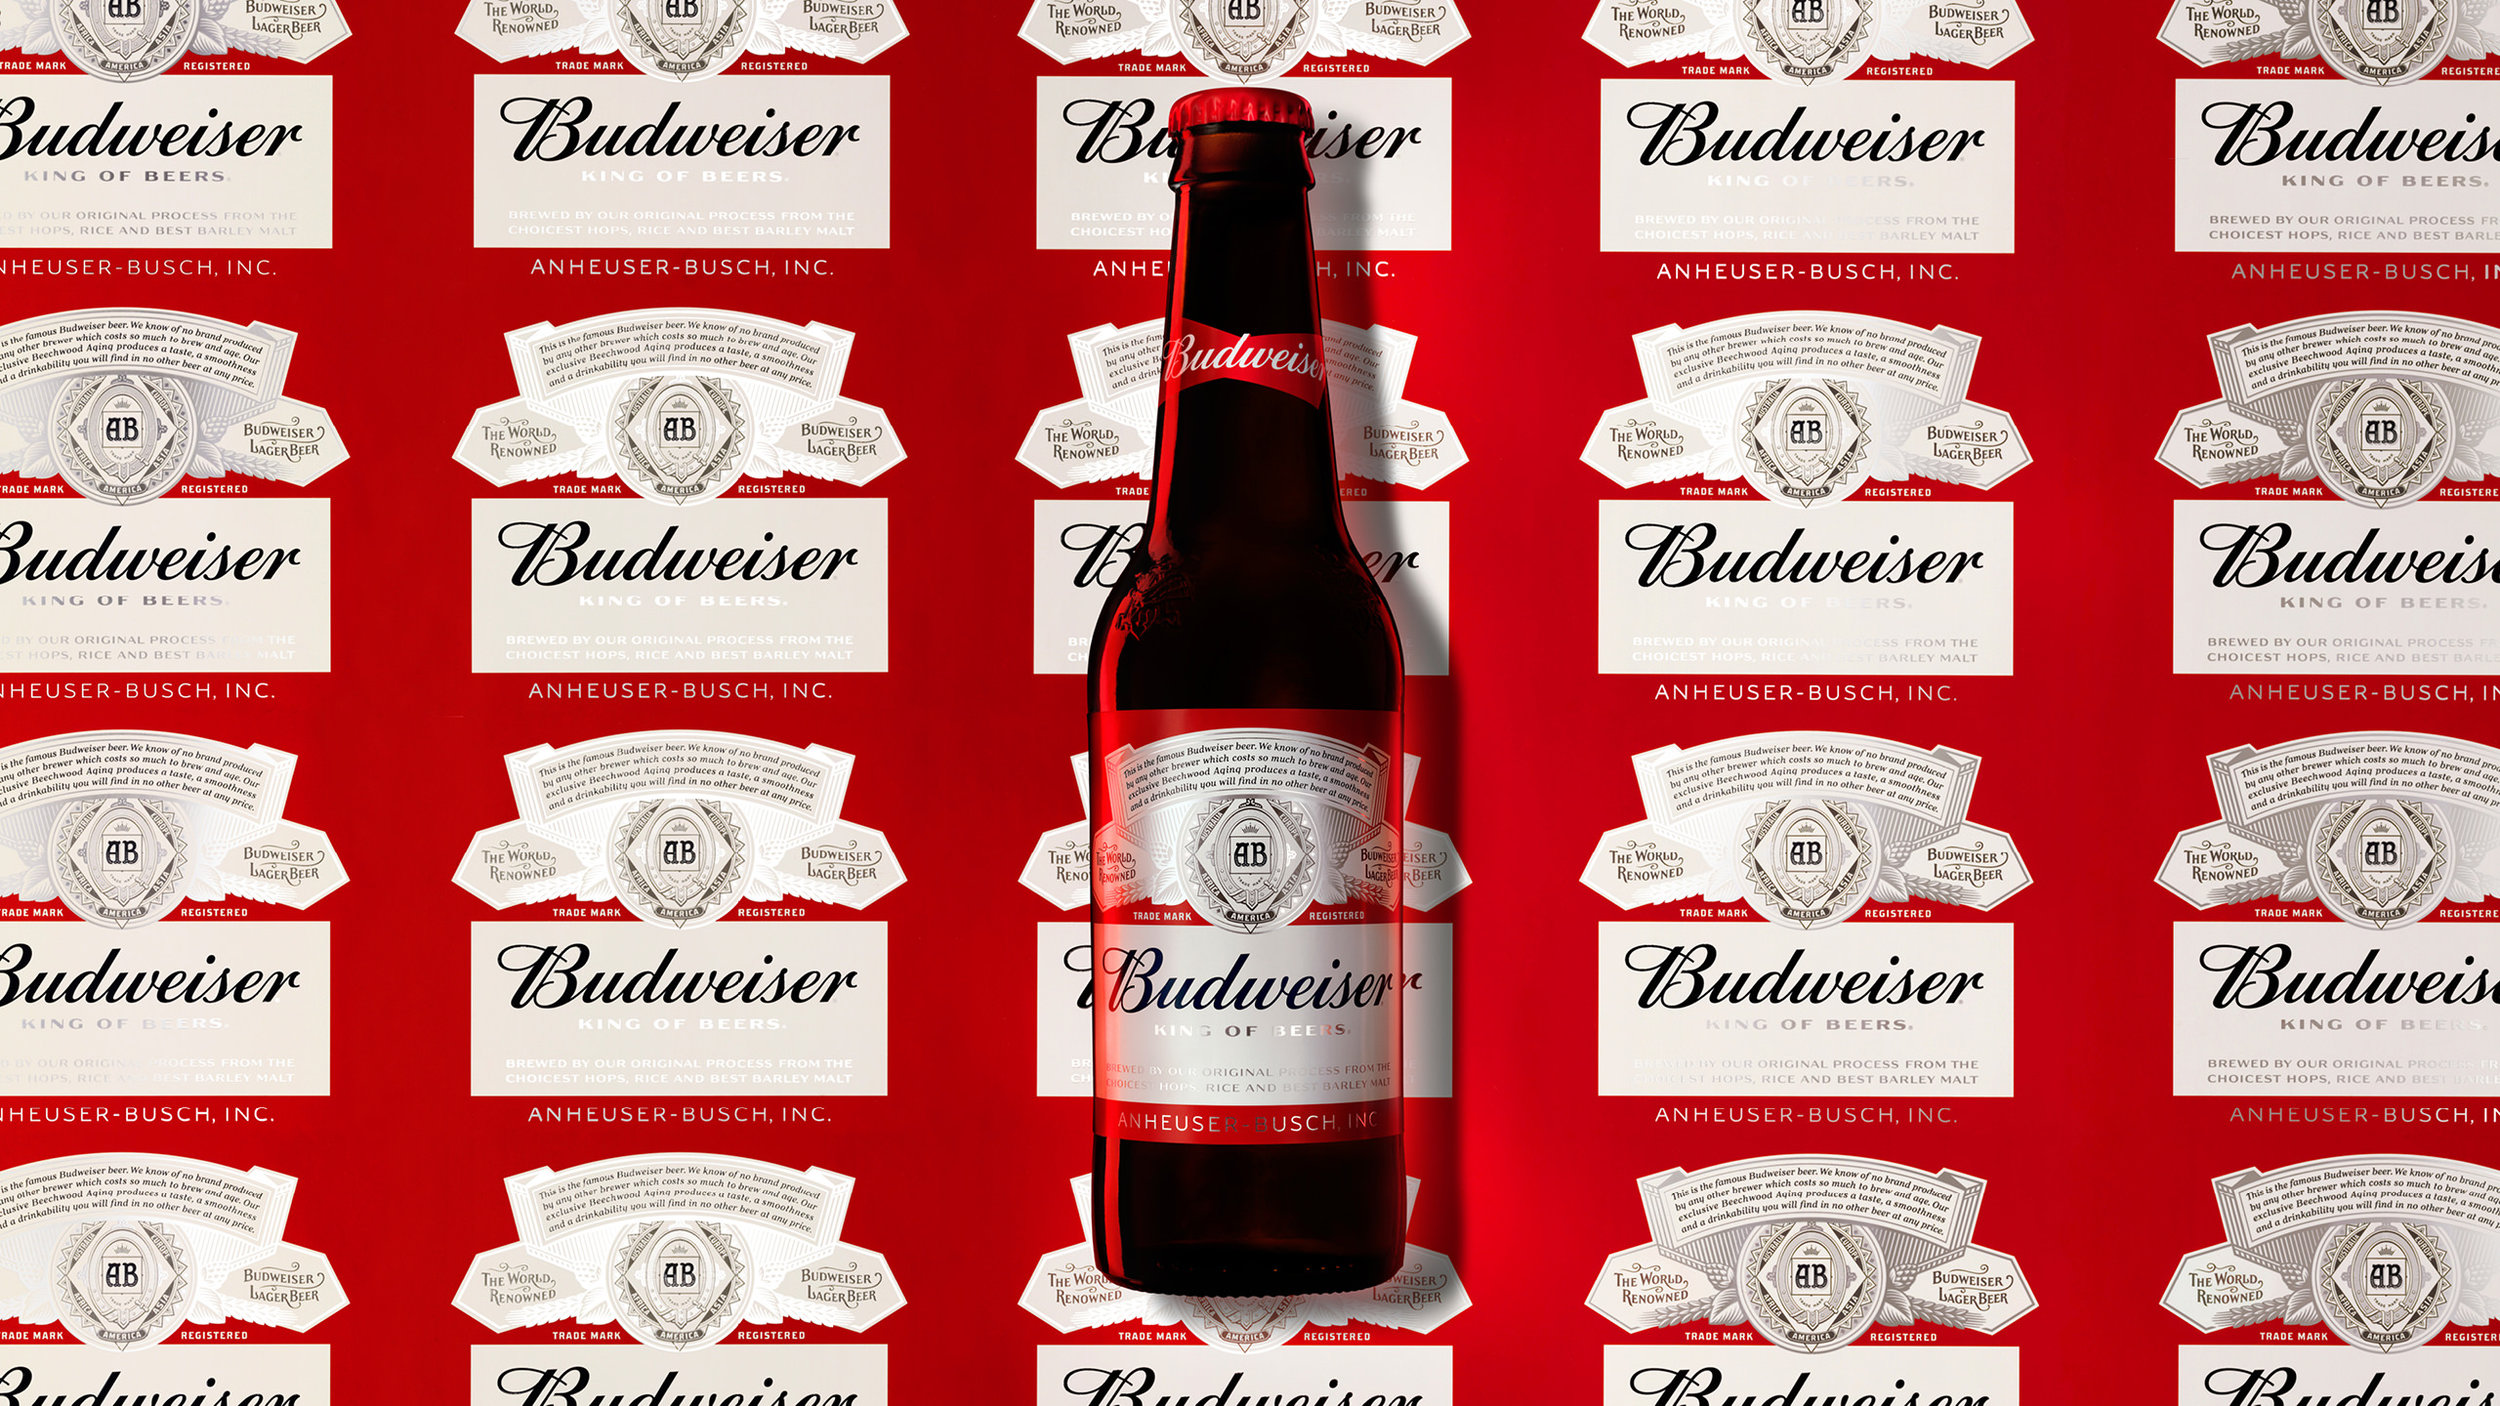 Budweiser Global Rebranding